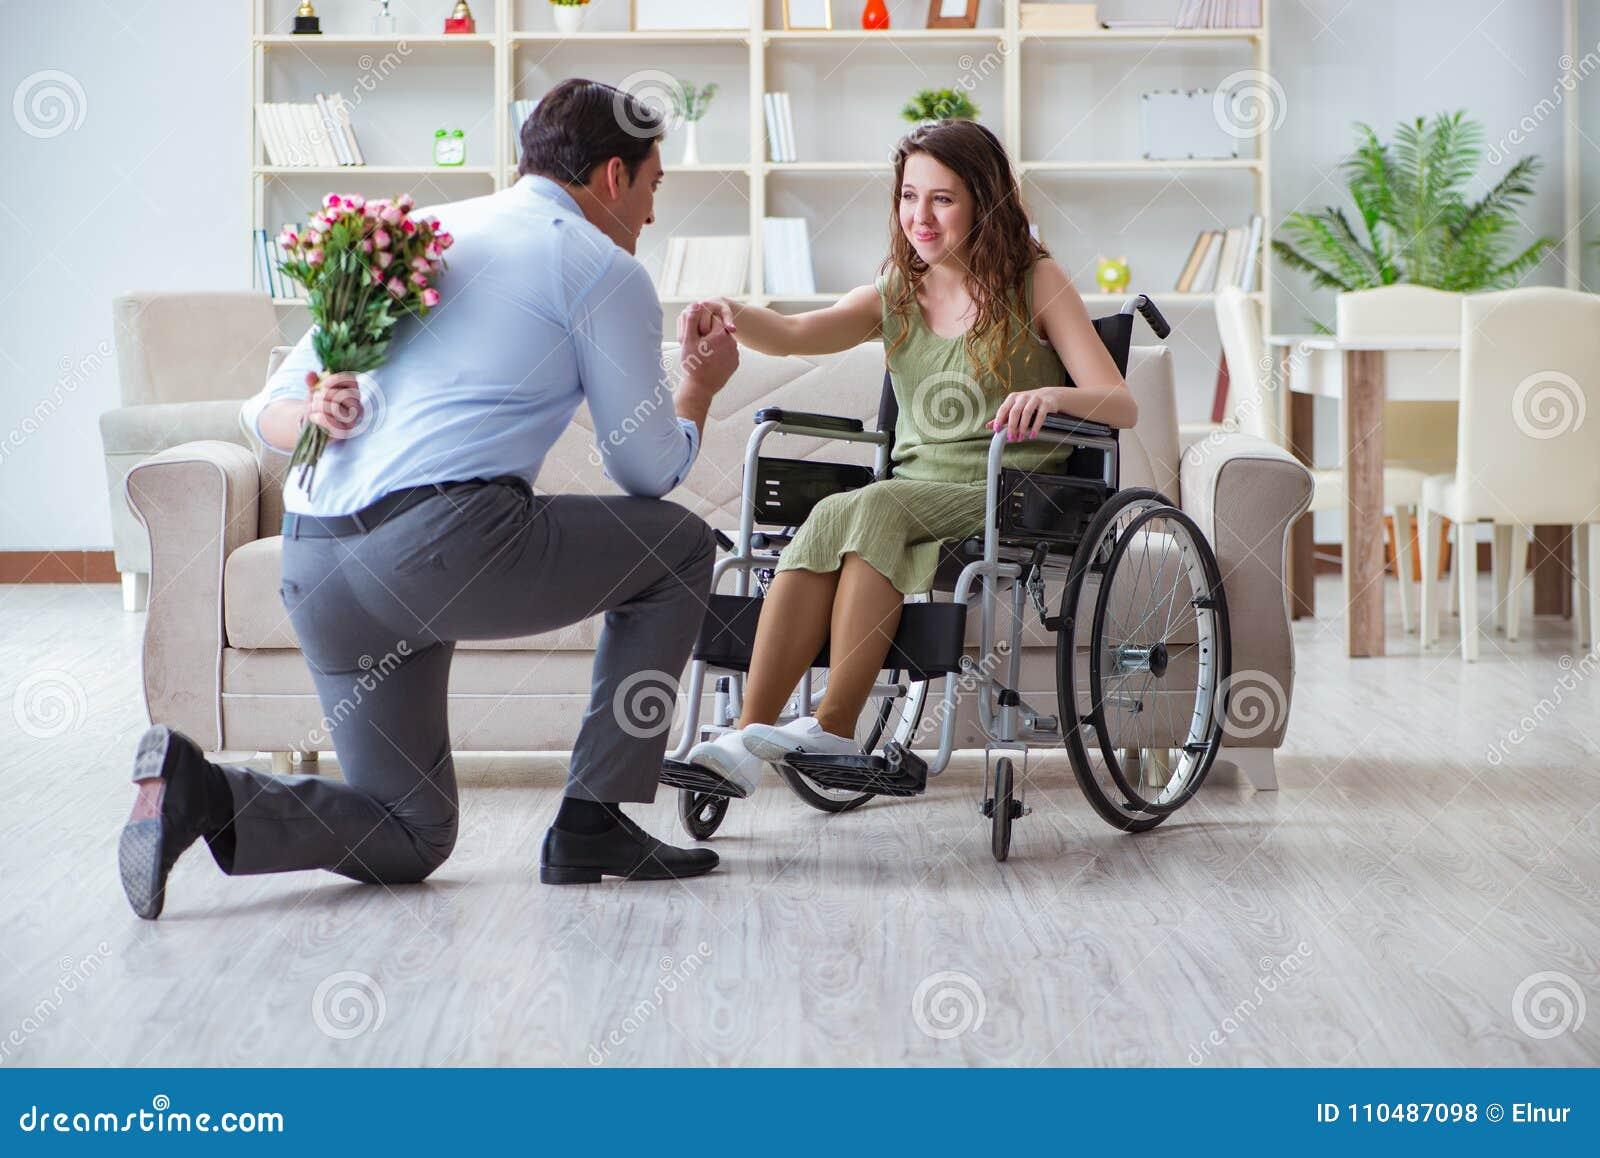 dating με μια γυναίκα με ειδικές ανάγκες διάρκεια μαθησιακής δραστηριότητας